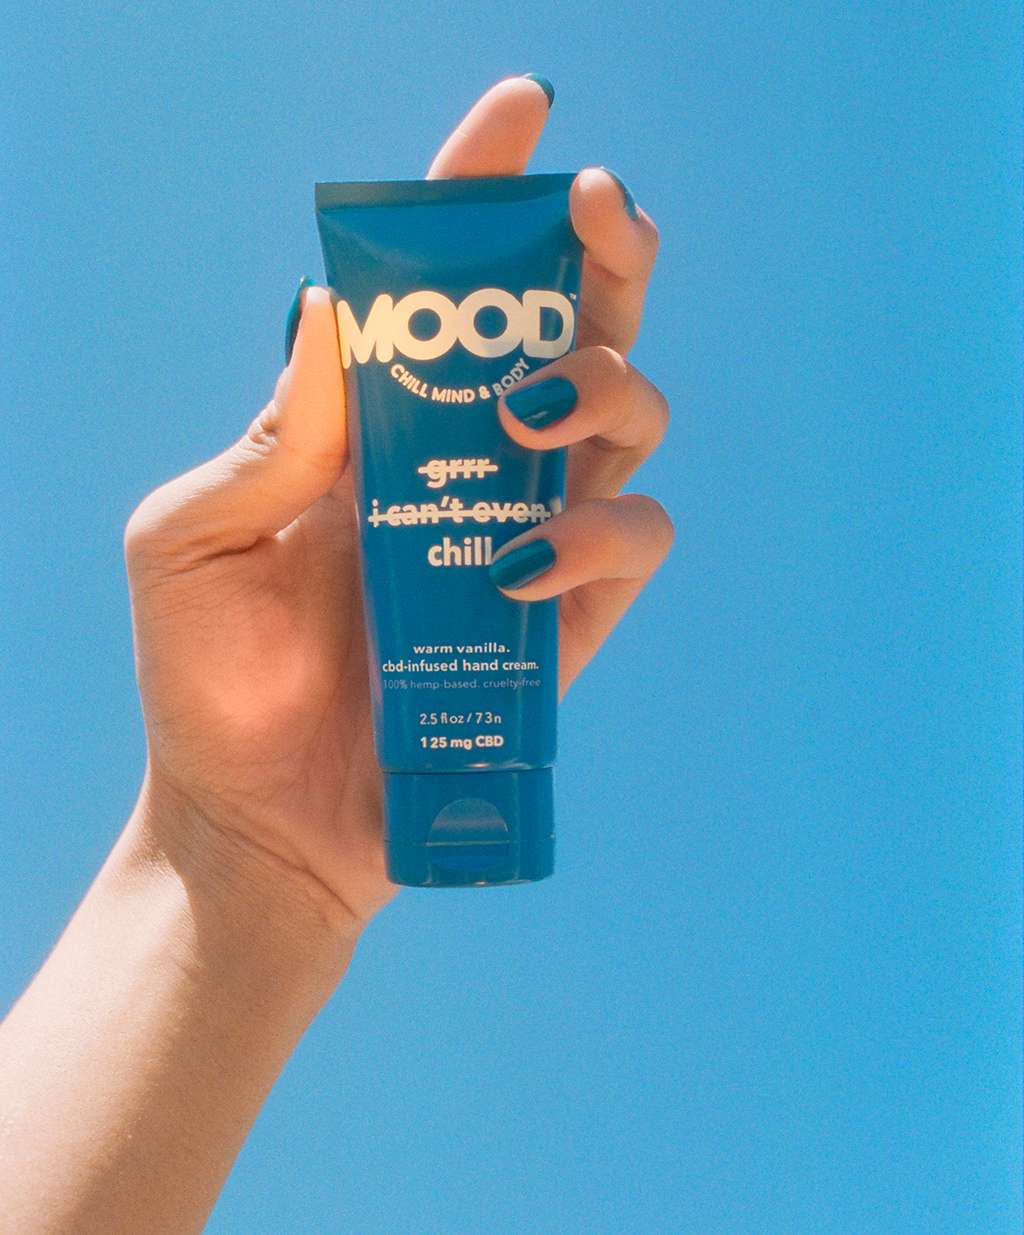 mood image blue